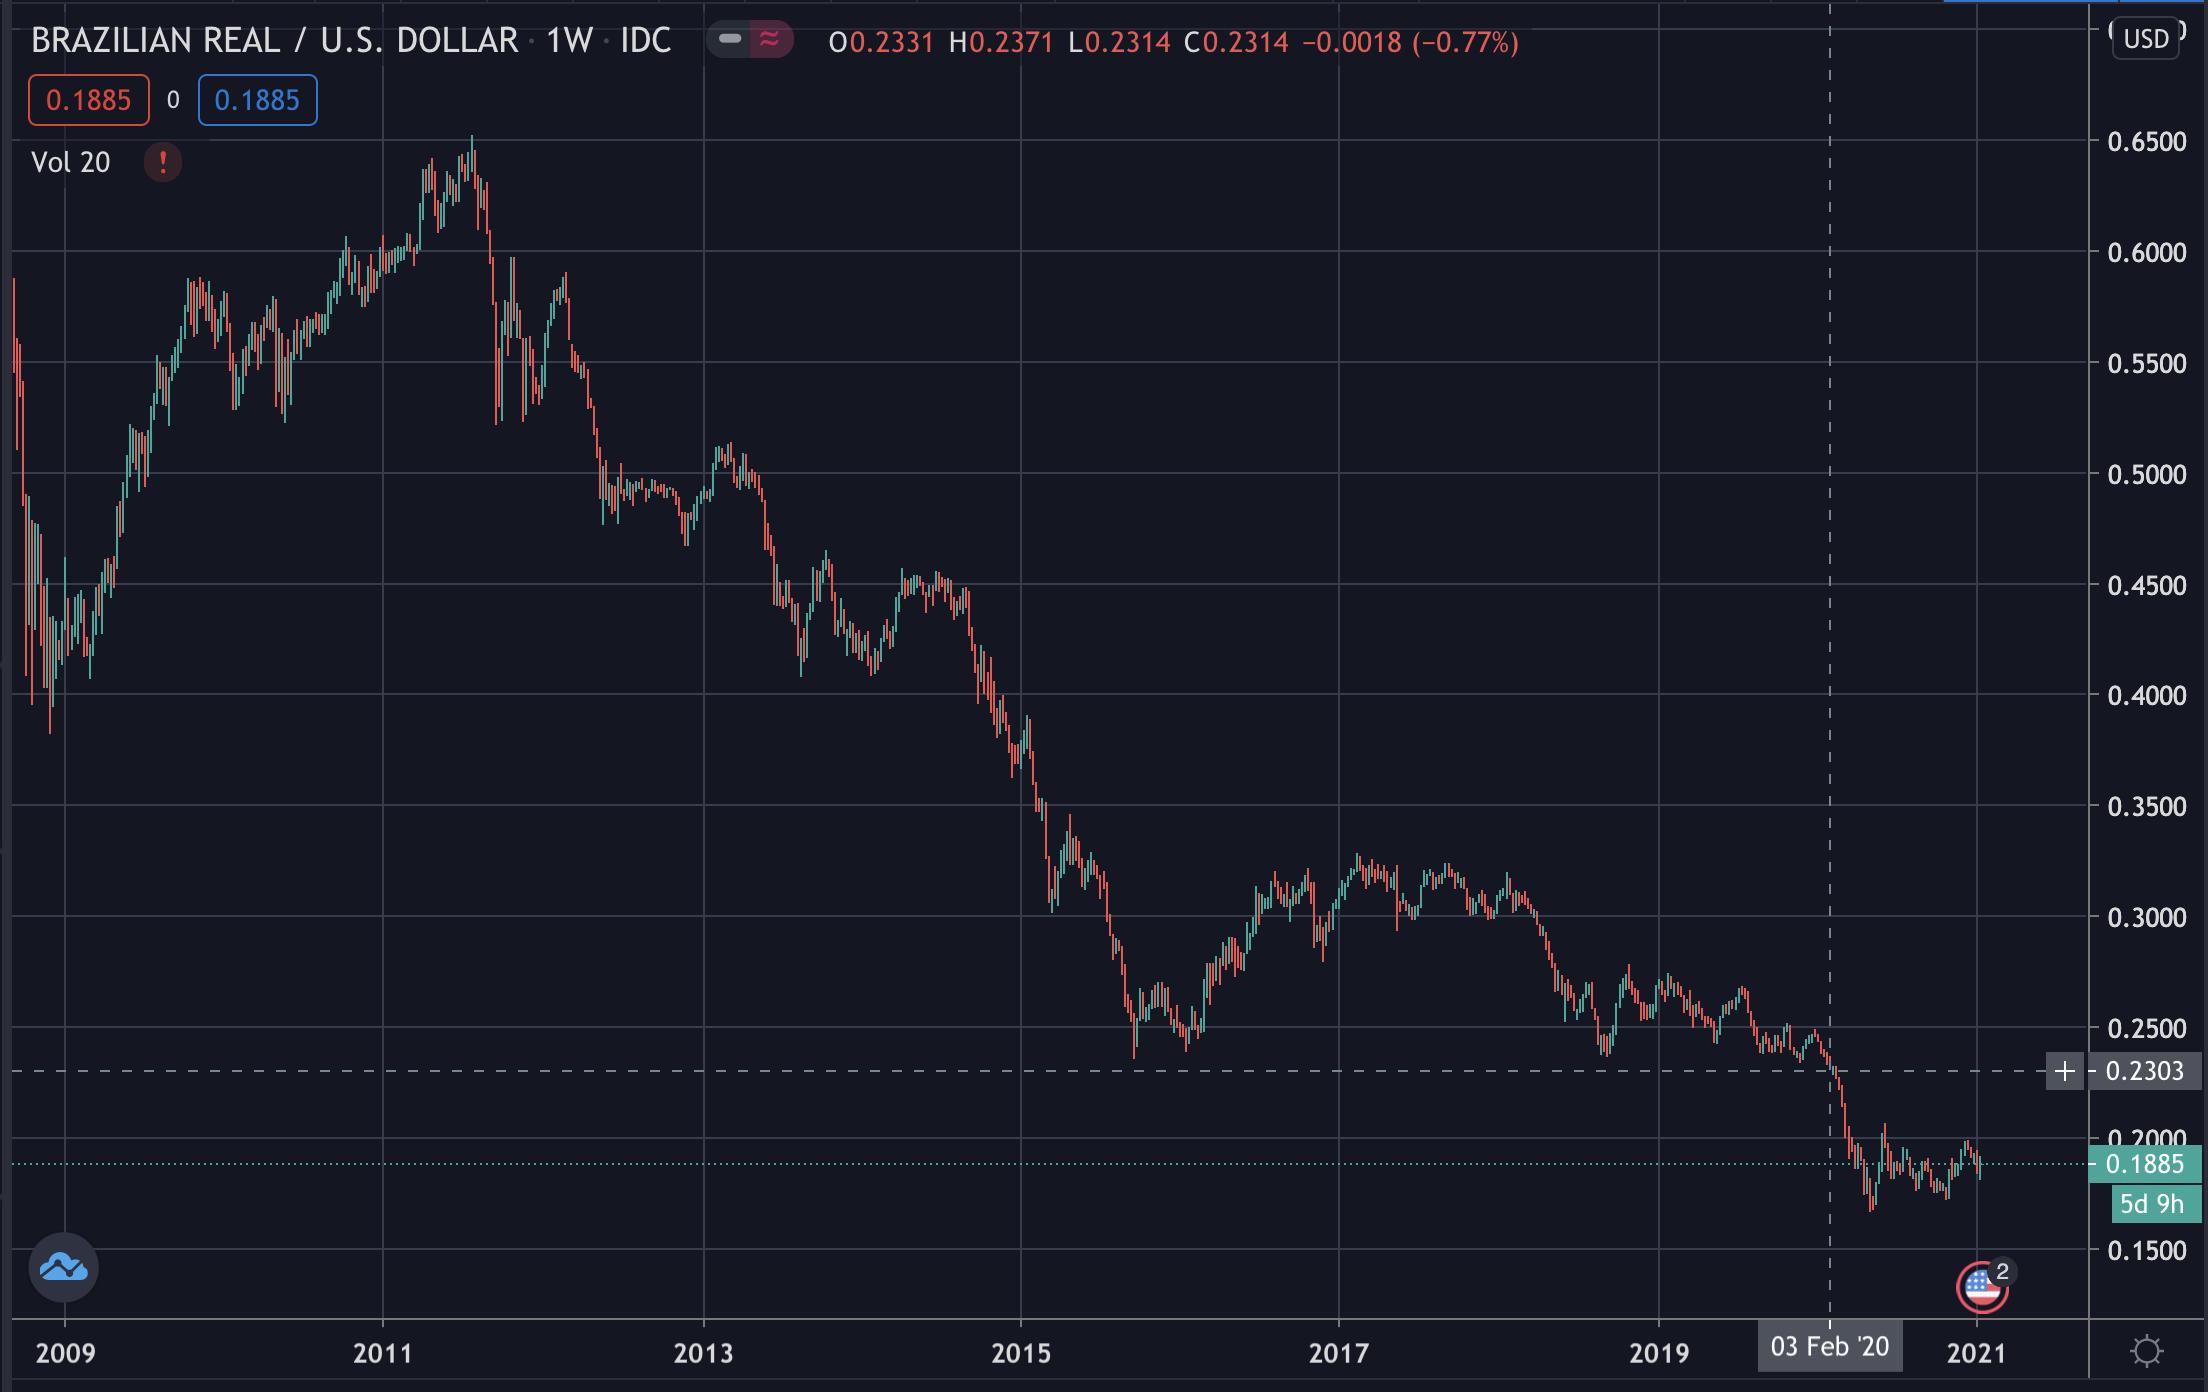 Brazilian Real / US Dollar, Jan 2021